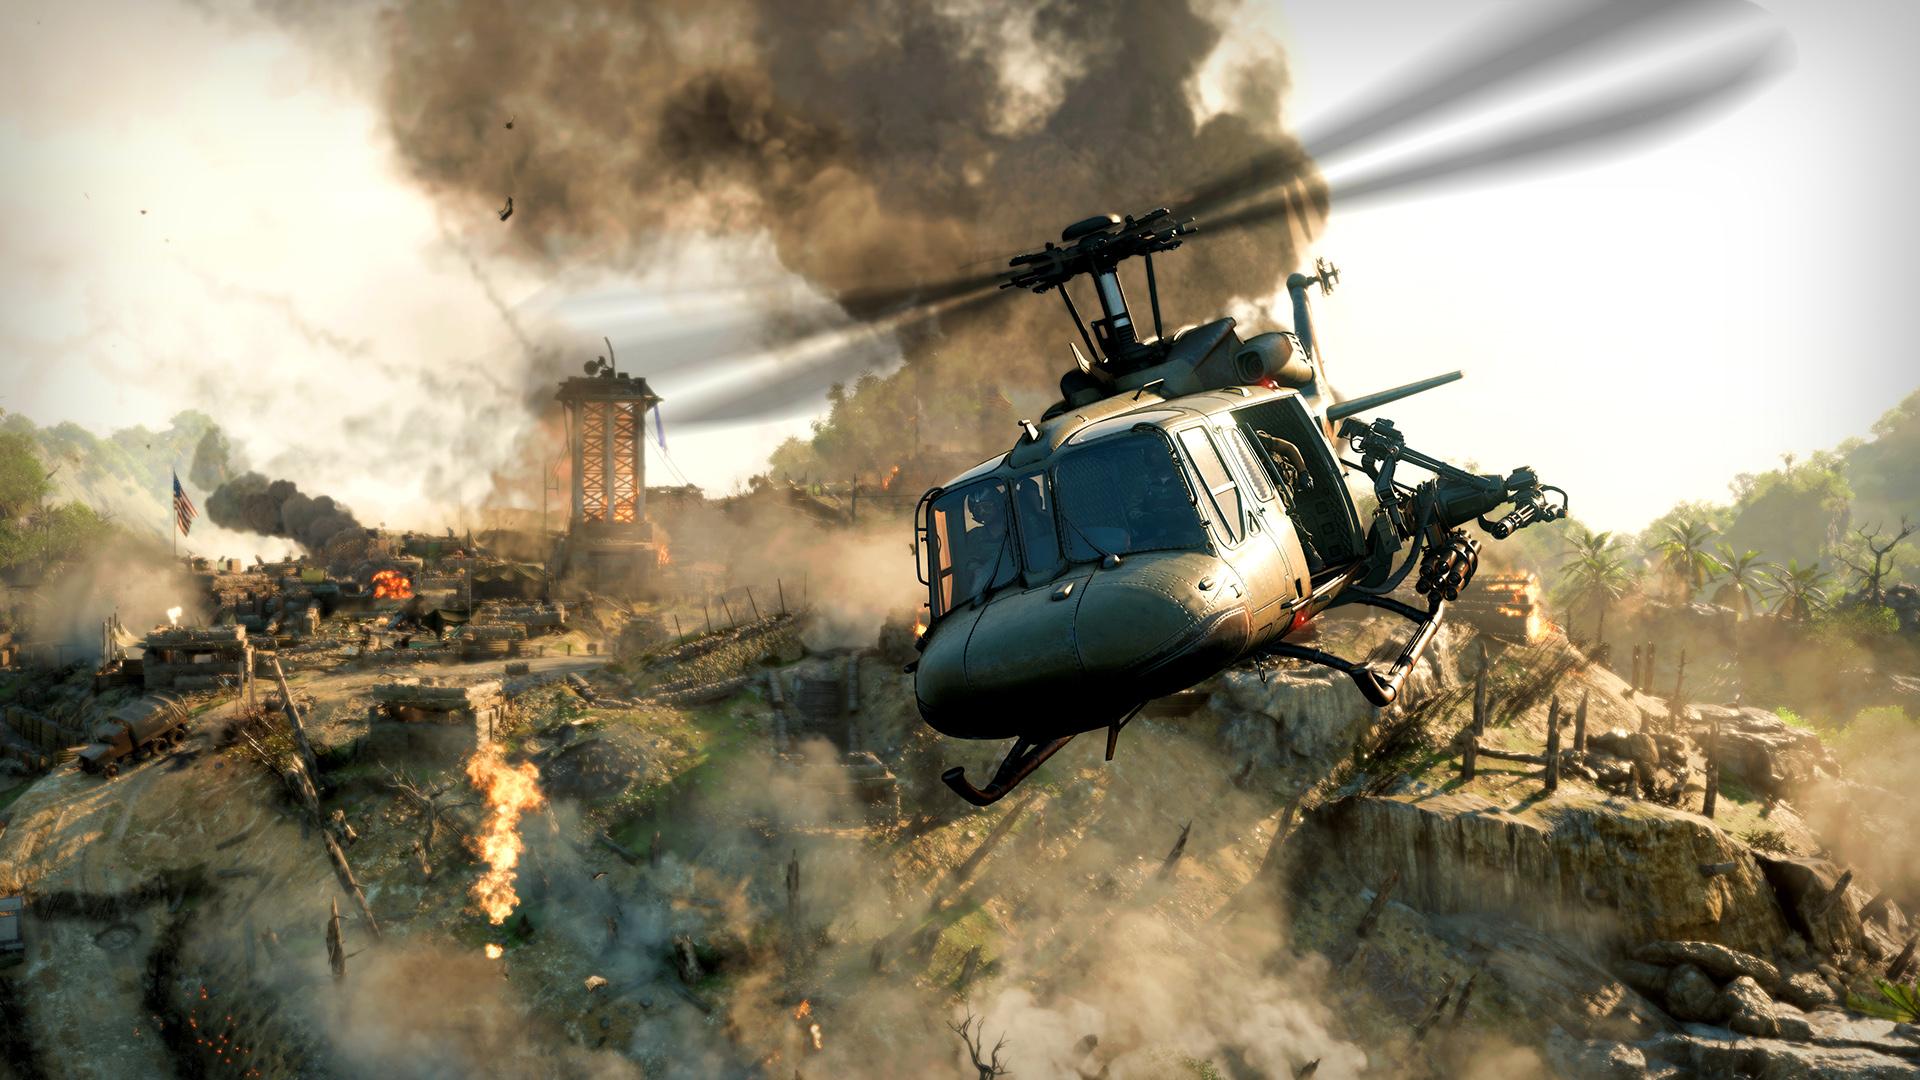 Call Of Duty Black Ops Cold War Developer Confirms 8 Multiplayer Maps At Launch Gamesradar